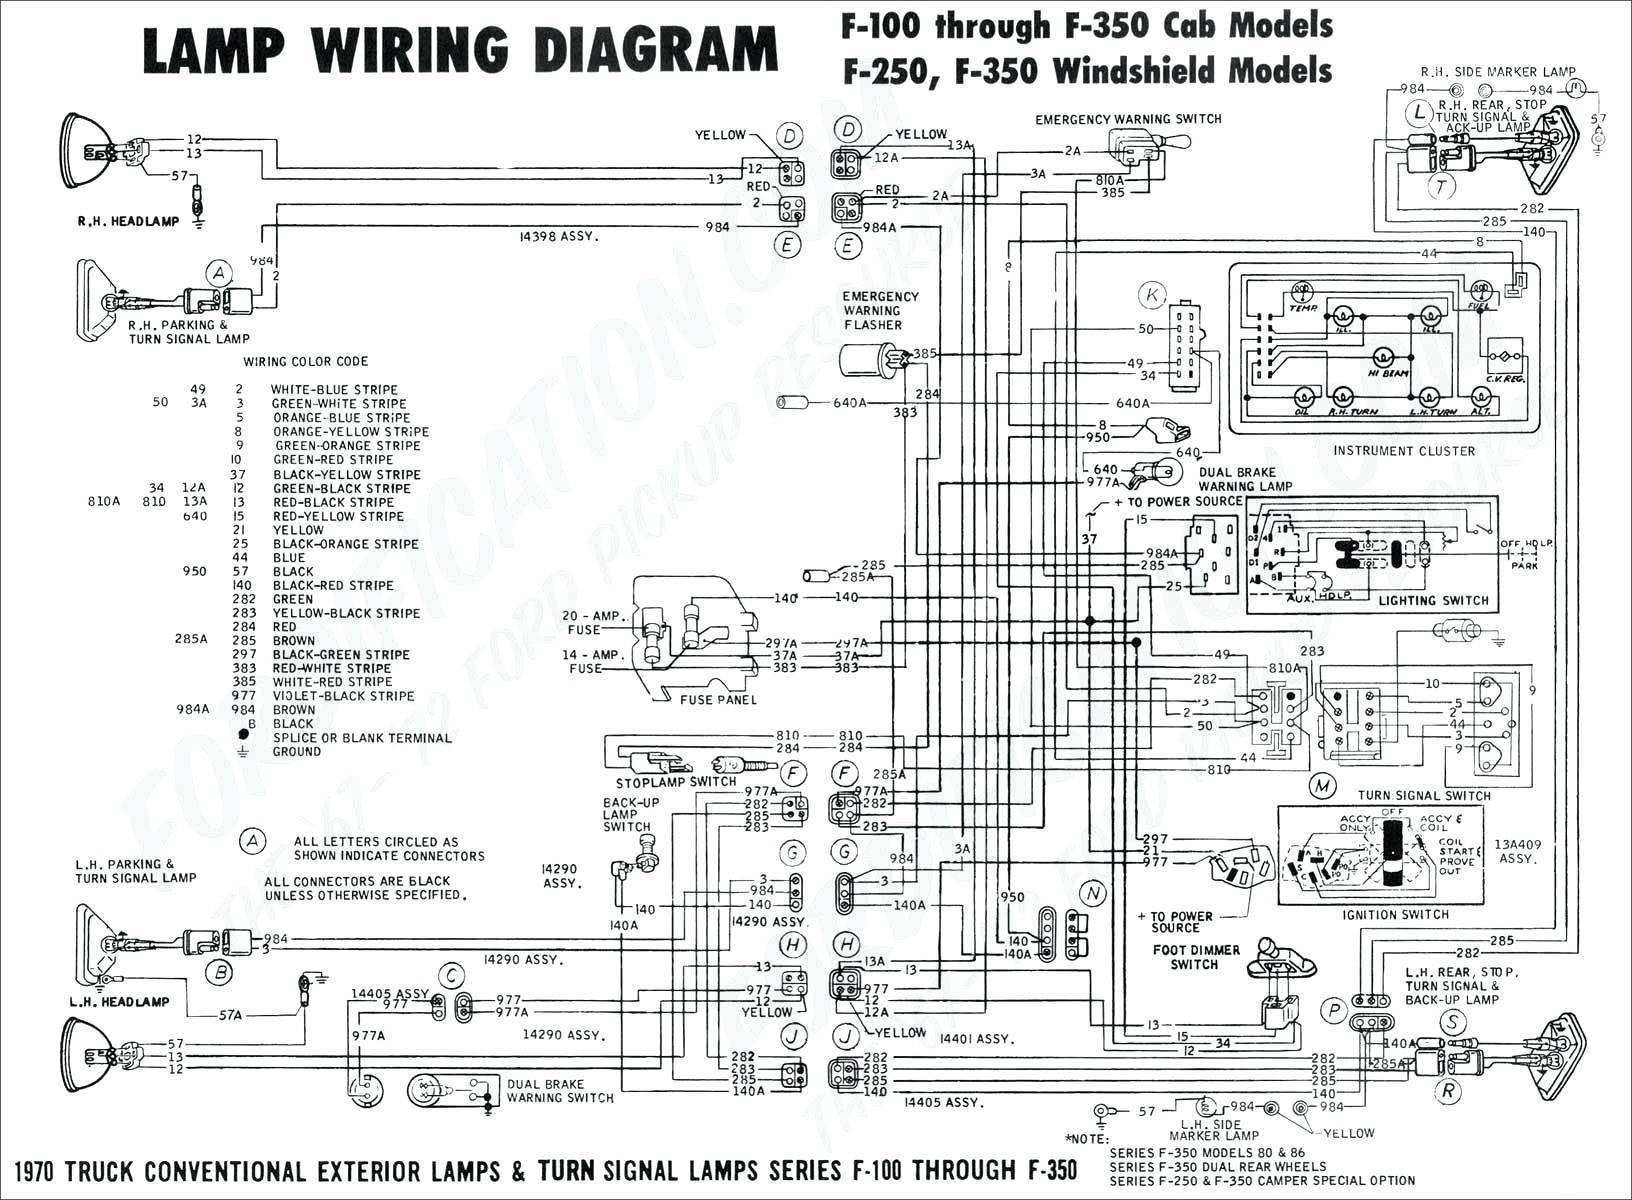 Car Subwoofer Diagram Wiring Diagram Car Ac Best 2004 Silverado Ac Schematic Schematics Of Car Subwoofer Diagram